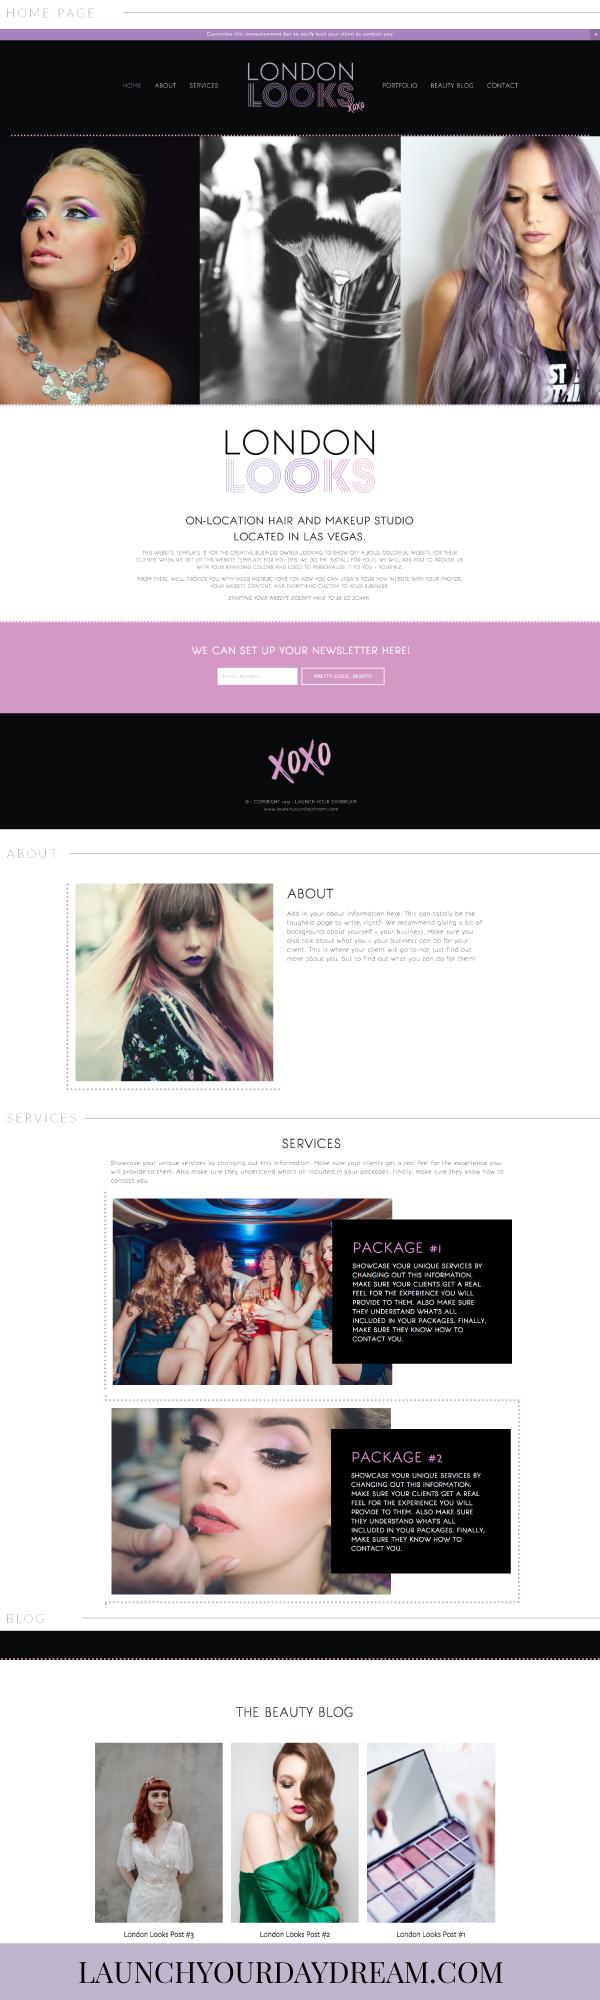 Bold edgy chic logo and custom squarespace website design